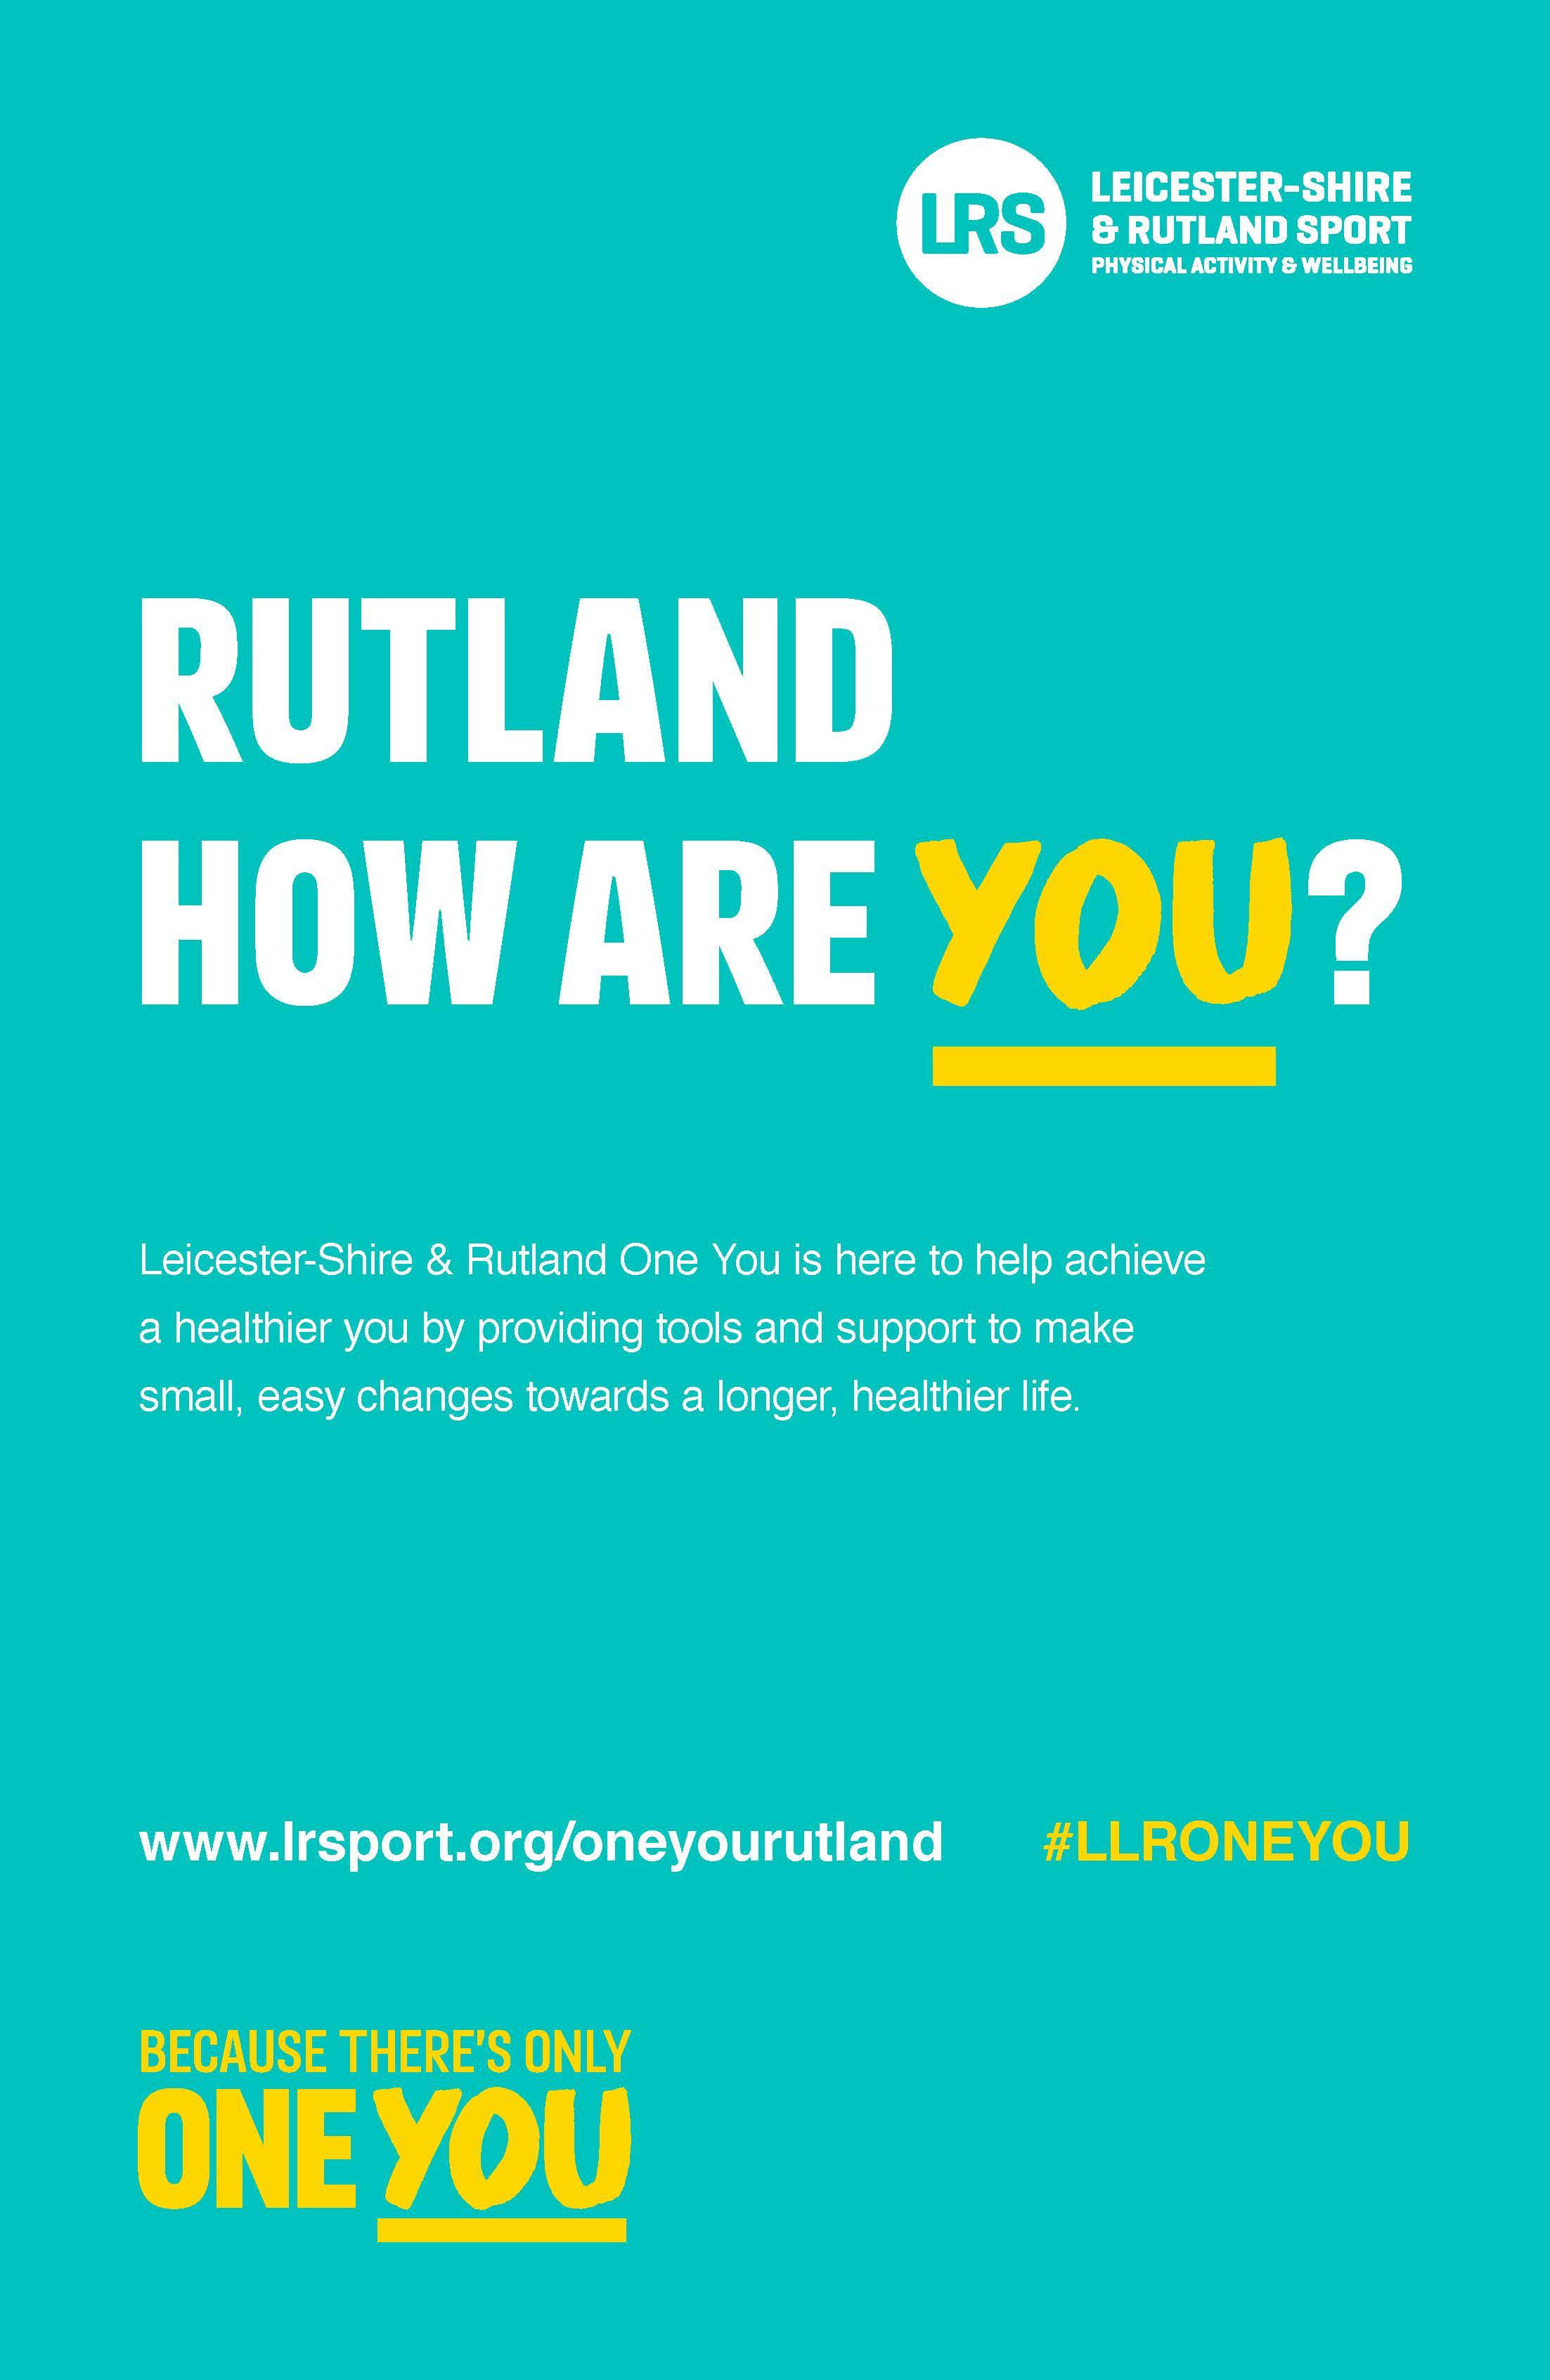 LRS One You_BP Station (Rutland).jpg